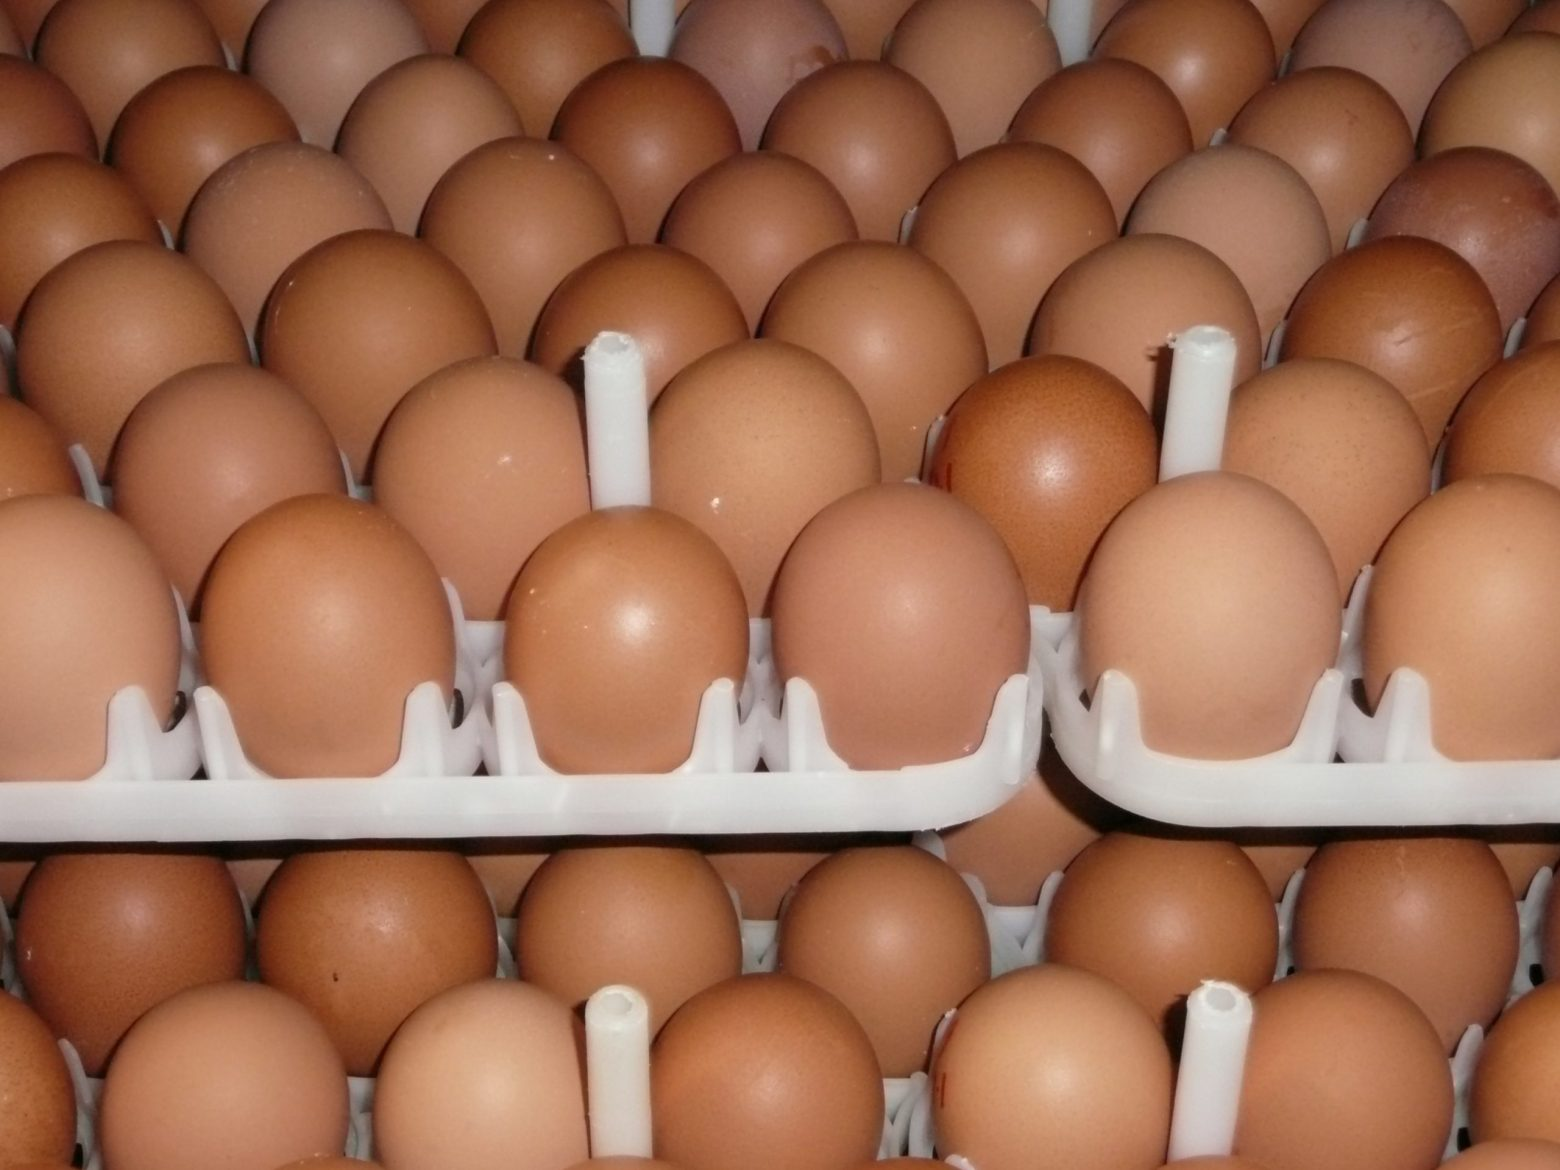 8+2 Hatching Chicken Eggs Backyard Cross